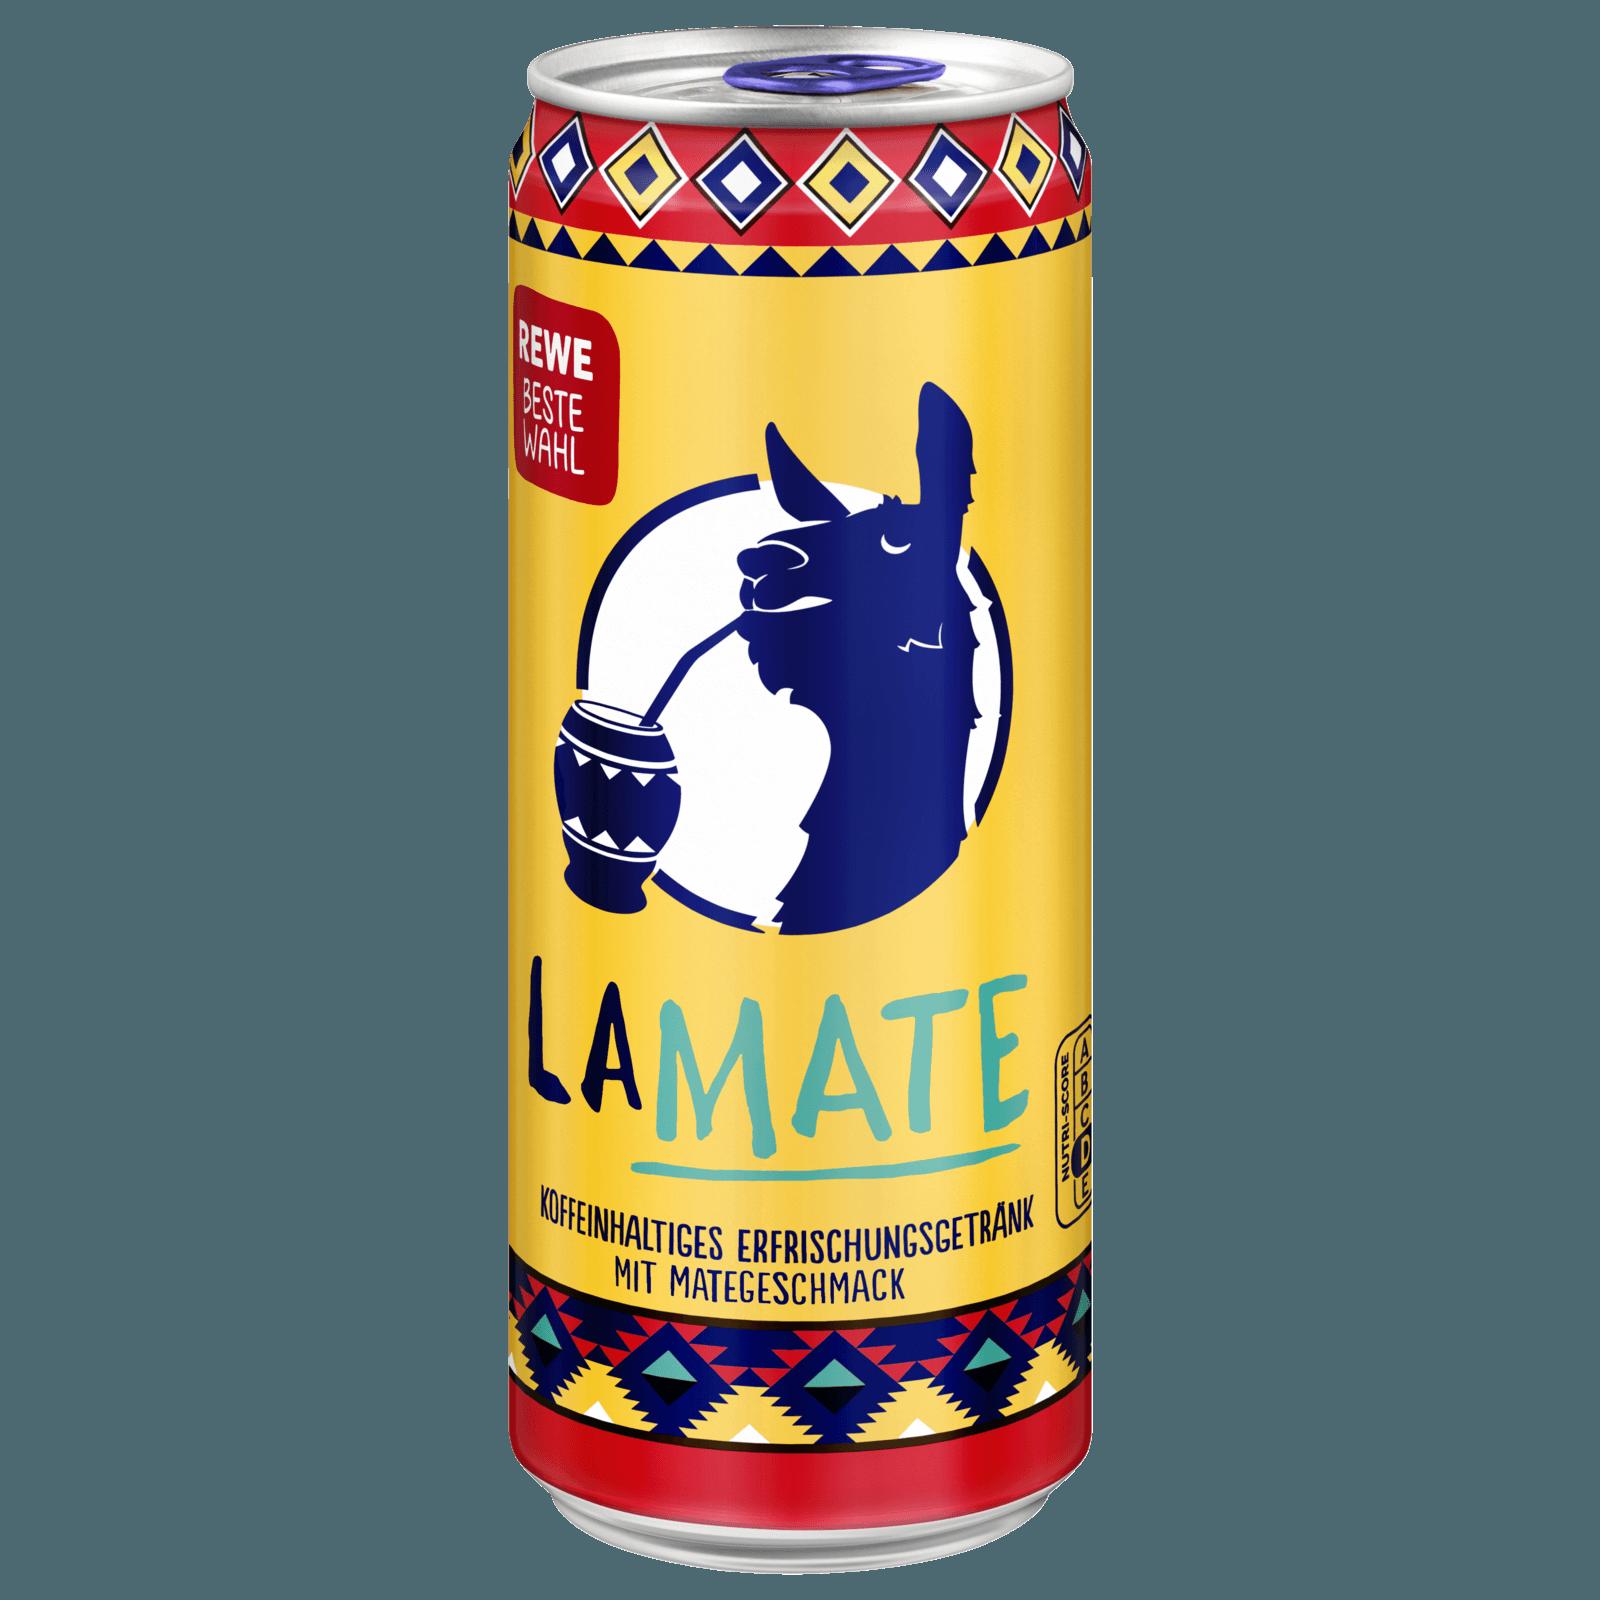 LaMate Koffeinhaltiges Erfrischungsgetränk mit Mategeschmack 0,3l